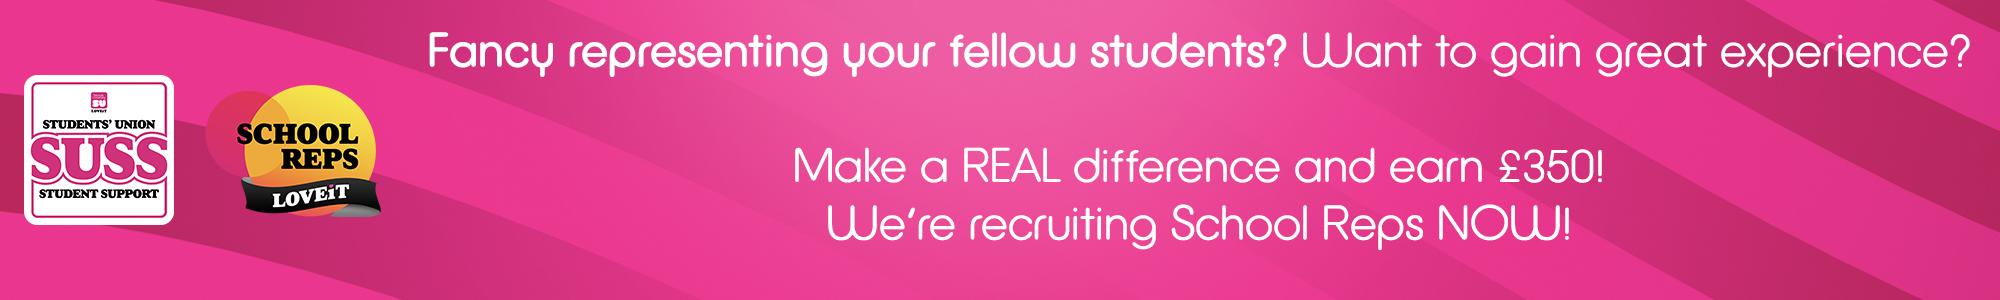 School reps recruitment web banner 2021